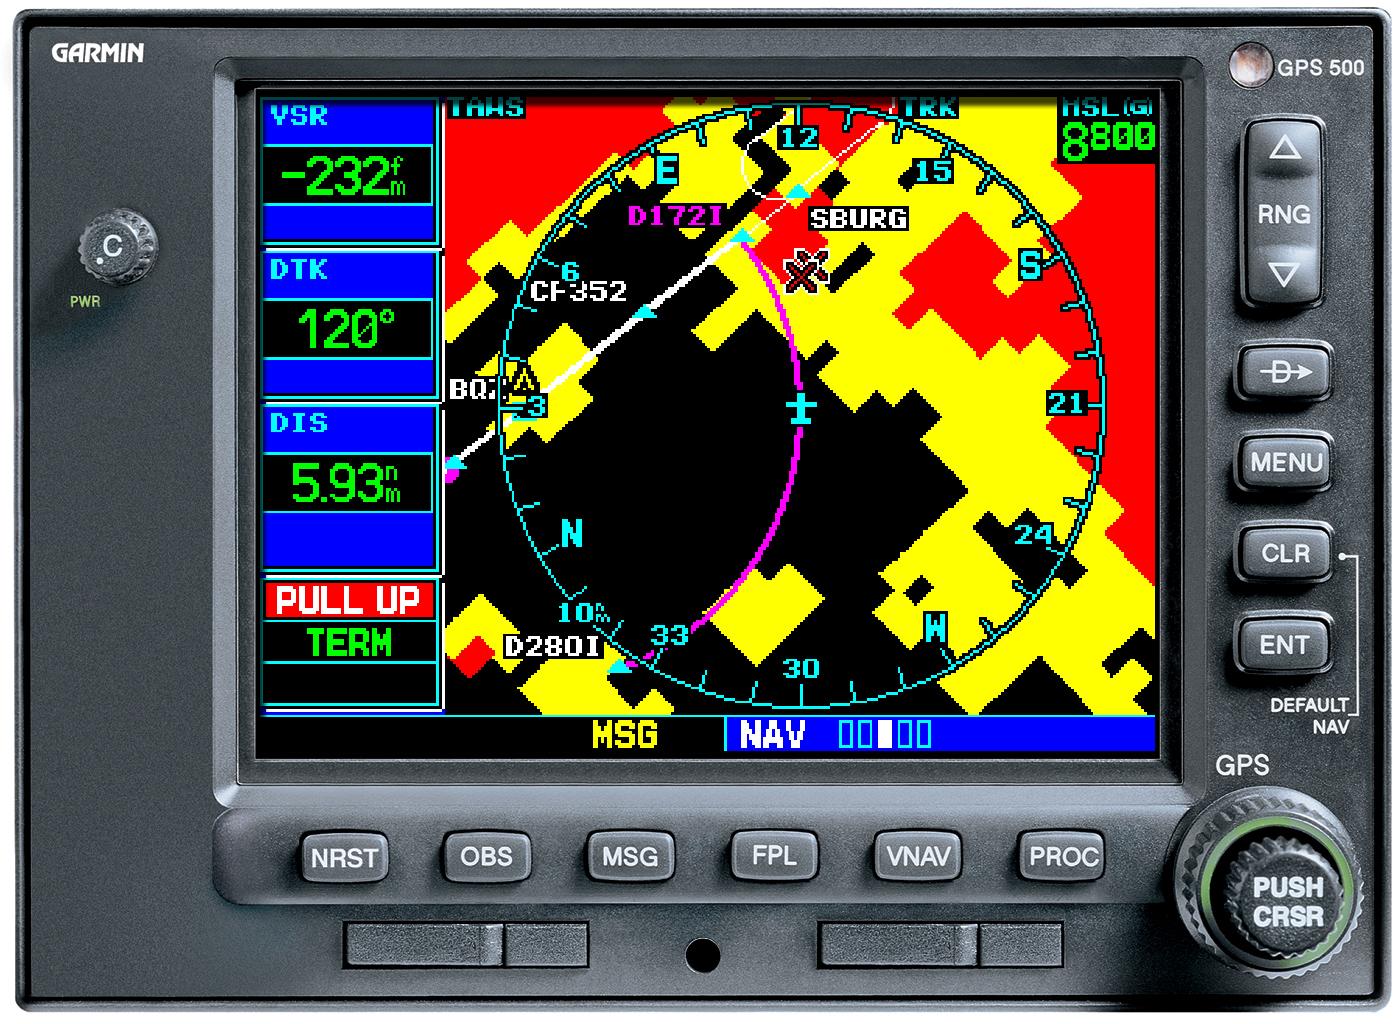 garmin media gallery rh www8 garmin com Garmin GPS 500 Series GPS Garmin Aera 500